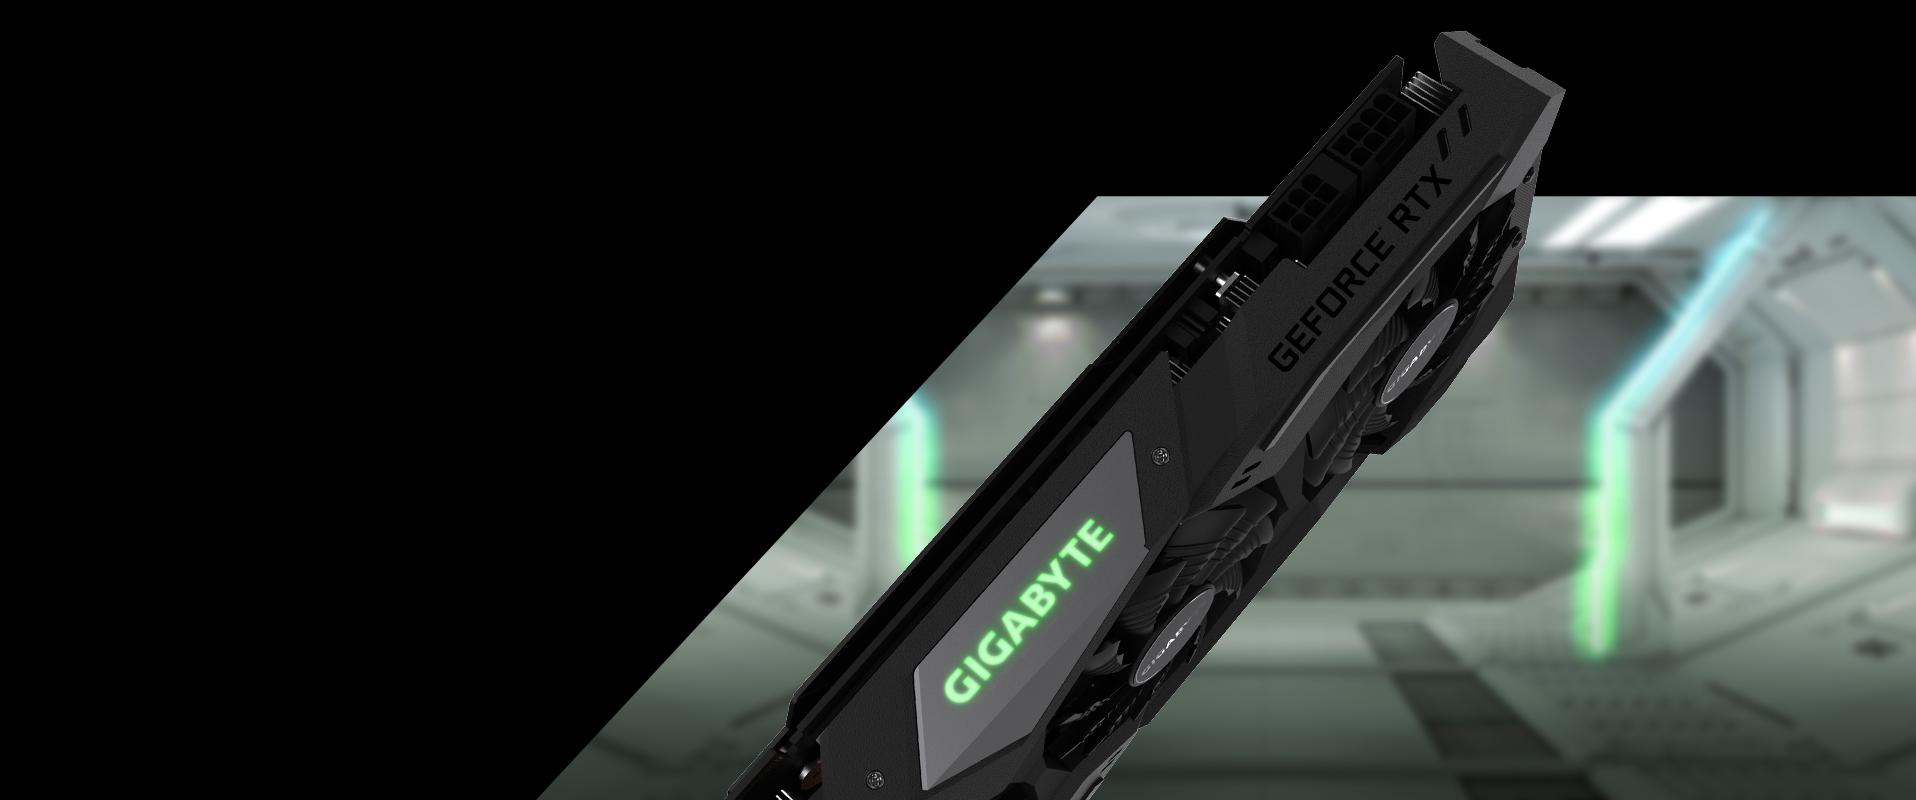 GeForce RTX™ 2080 WINDFORCE OC 8G   Graphics Card - GIGABYTE